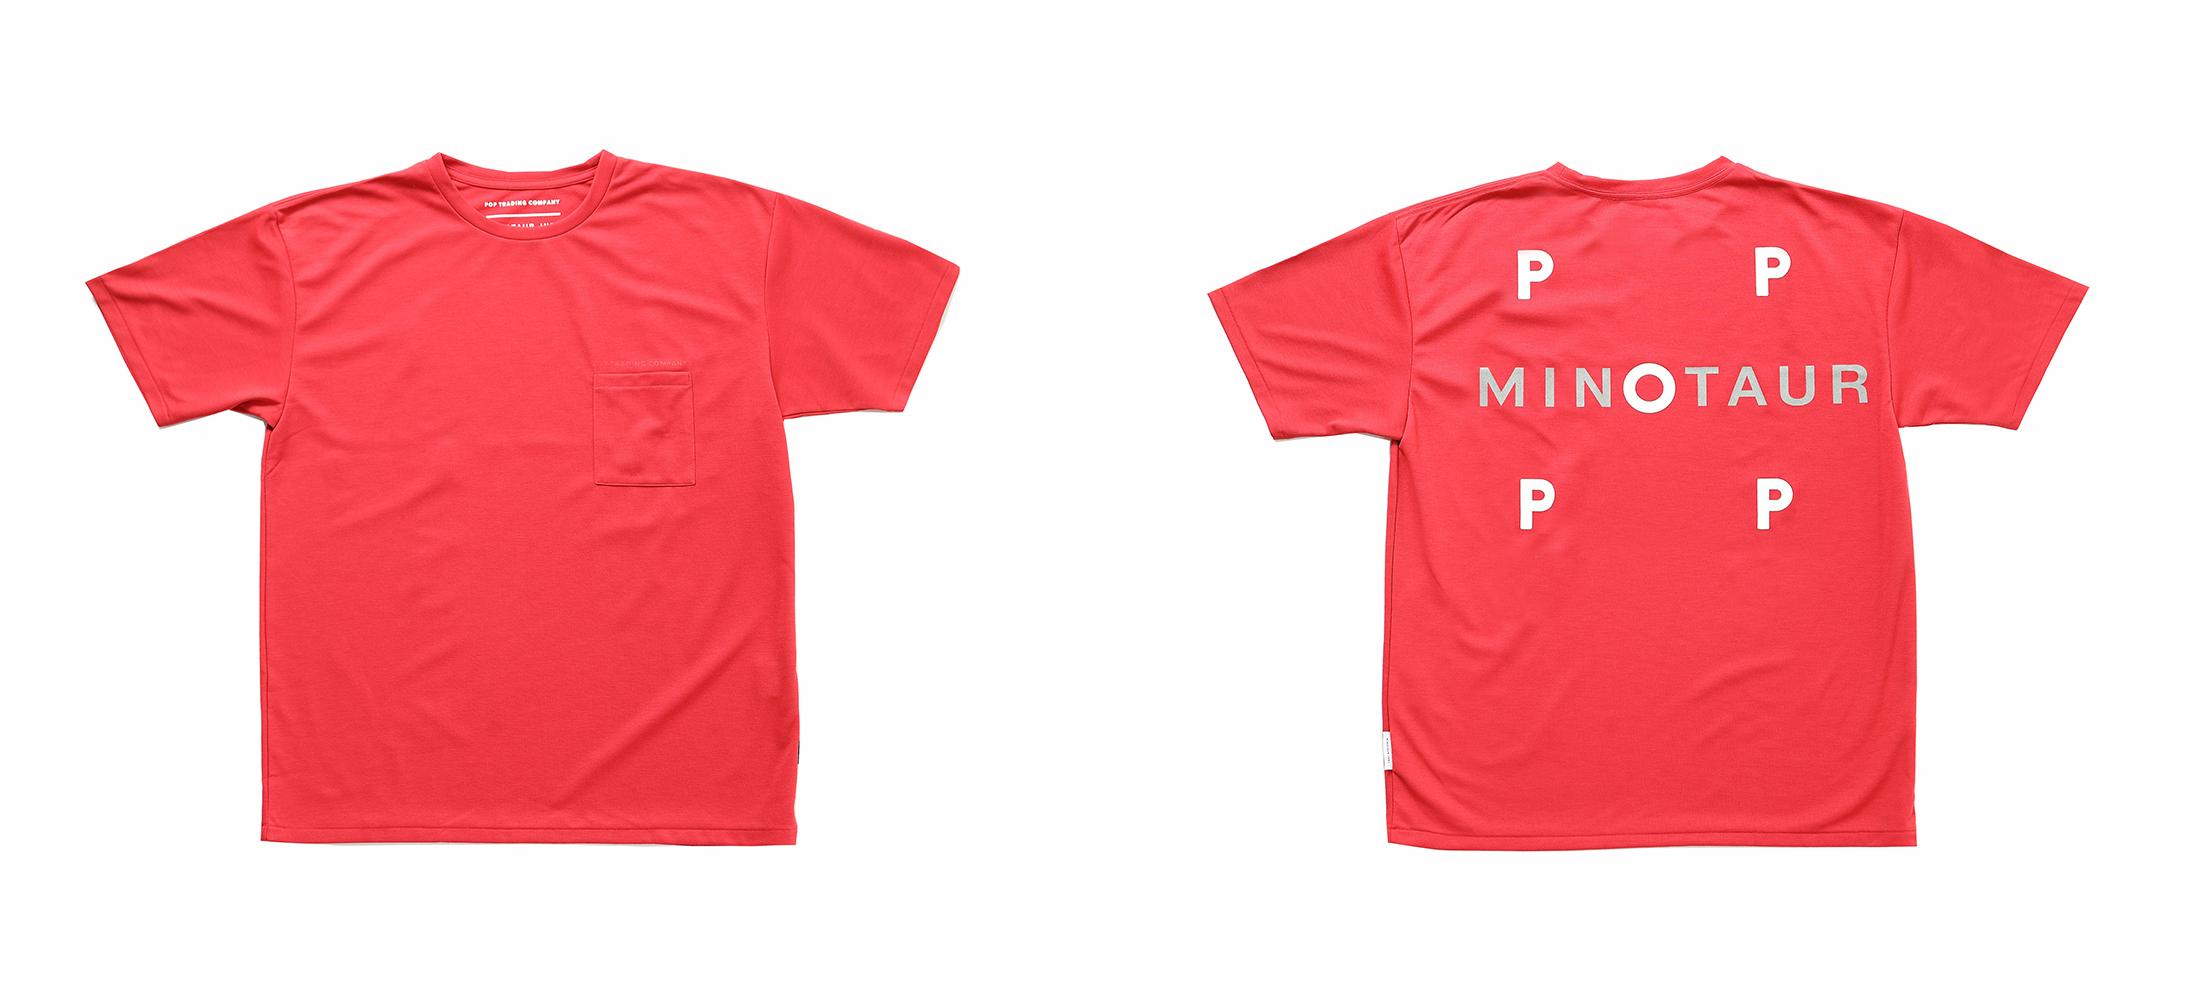 pop-trading-company-minotaur-product-5